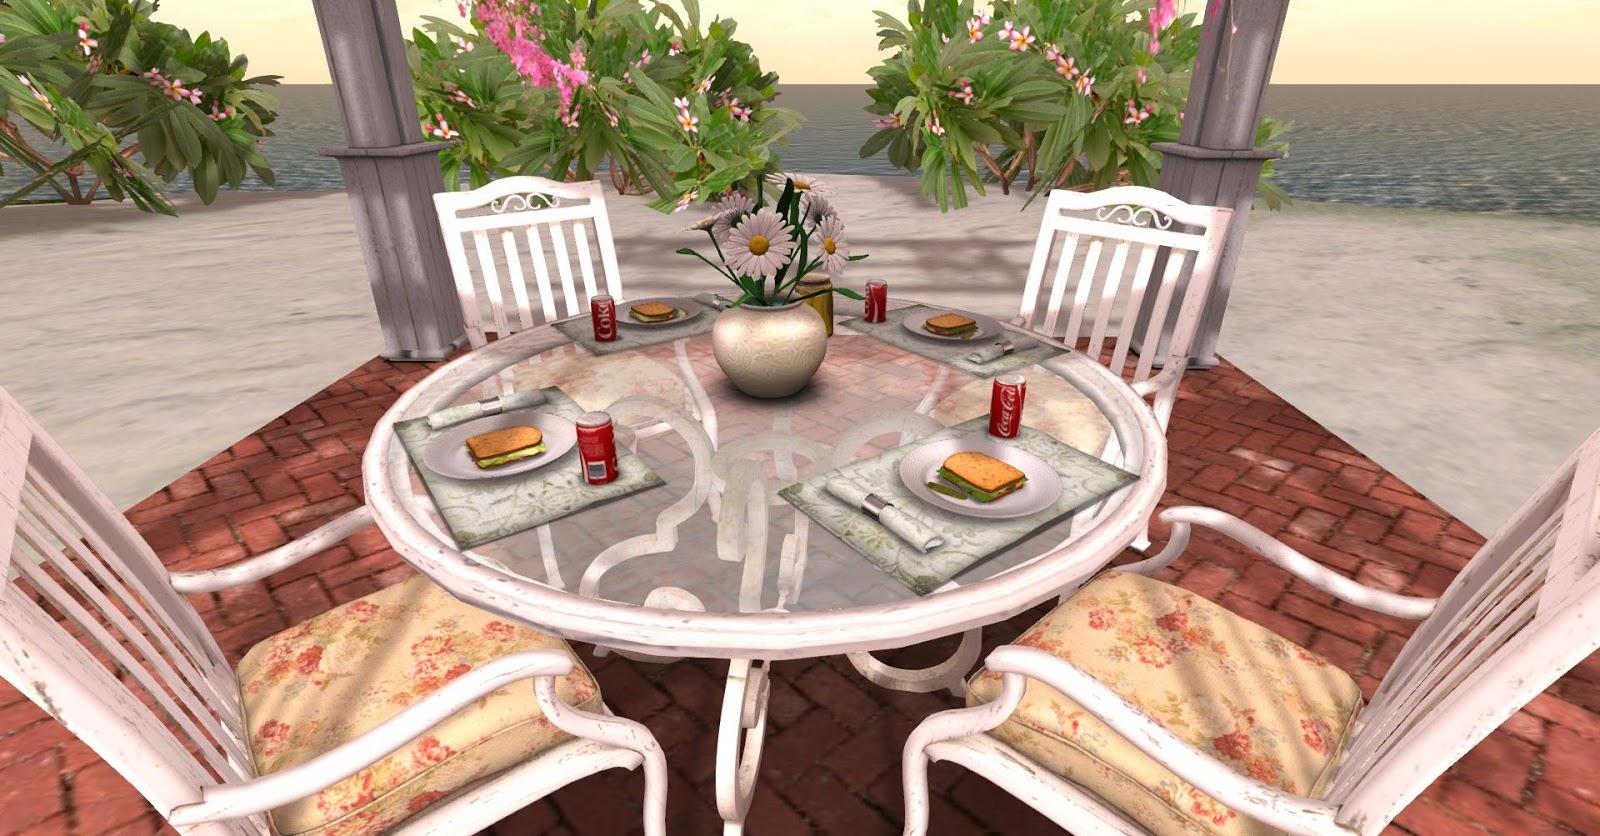 La Galleria: NEW! White Wrought Iron MESH Patio Dining Set